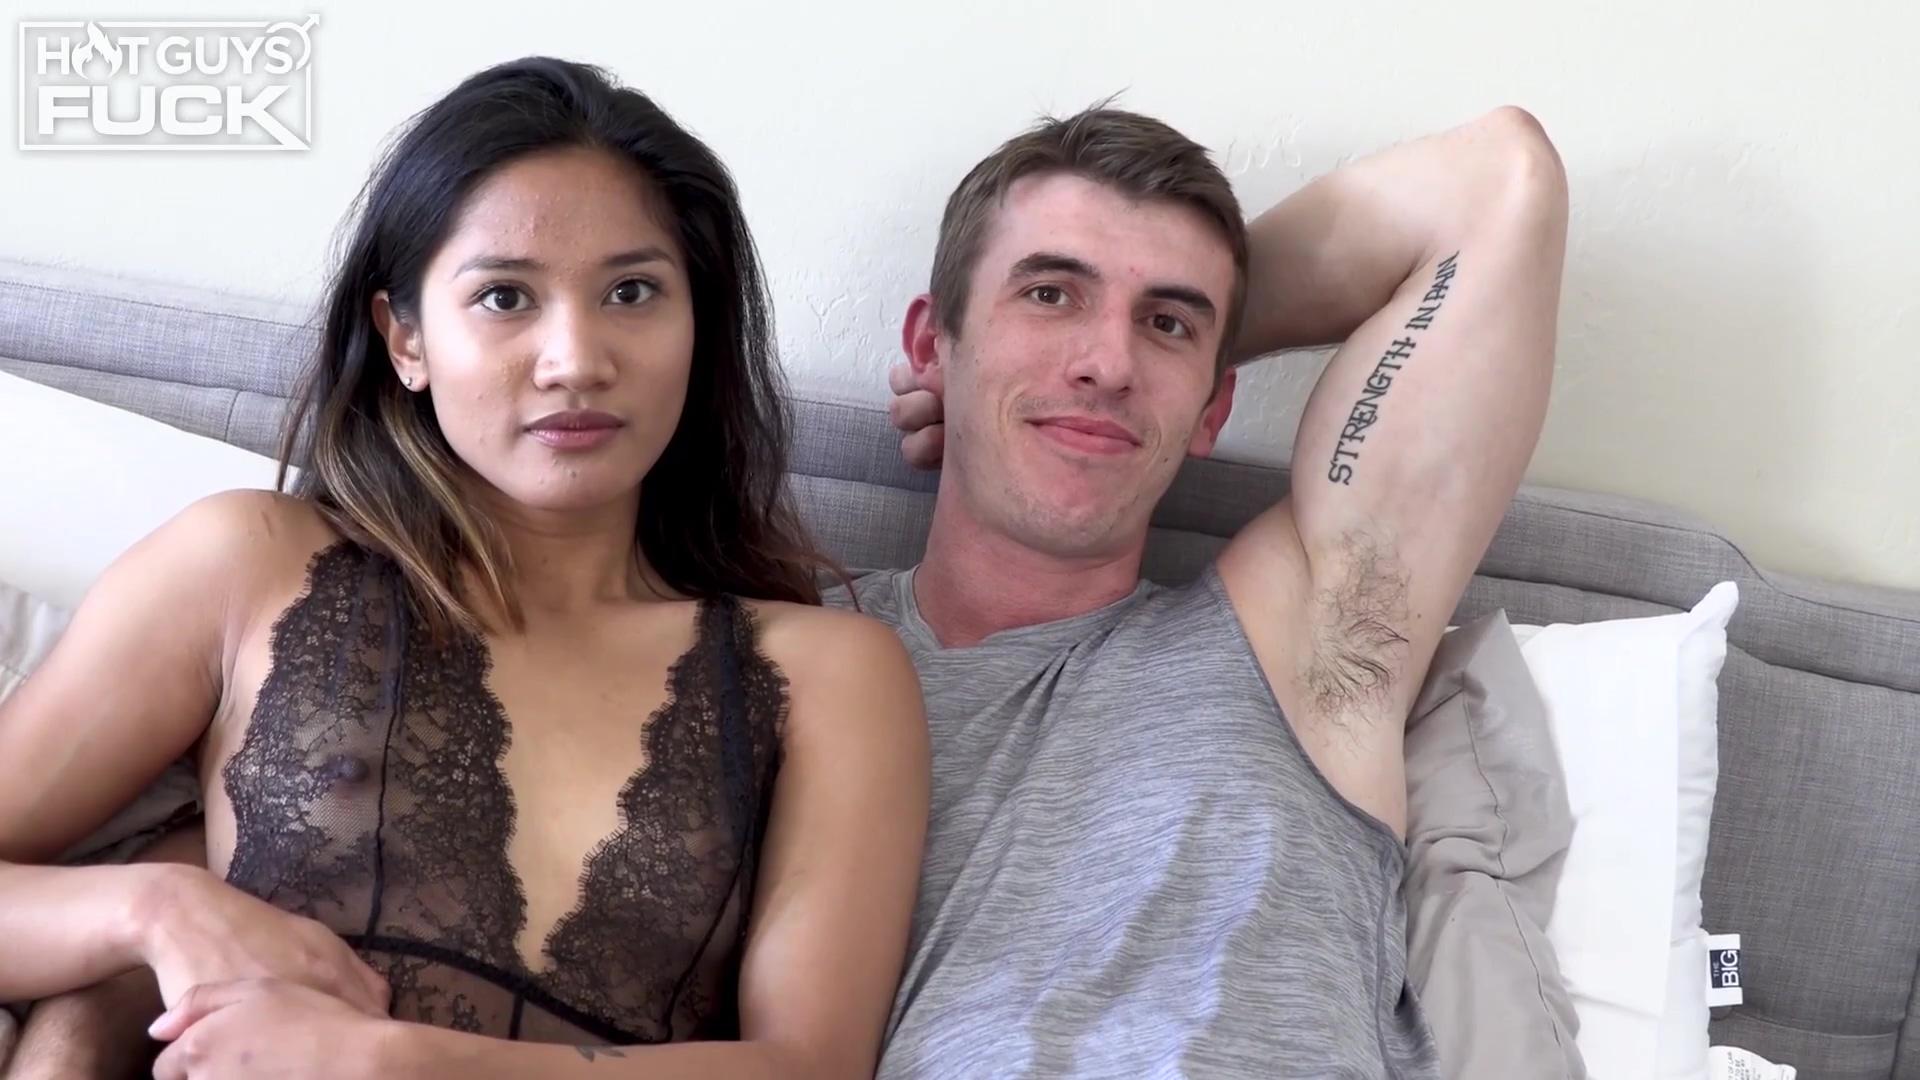 Joel Gordo And Tina Torres Have Amazing Porn